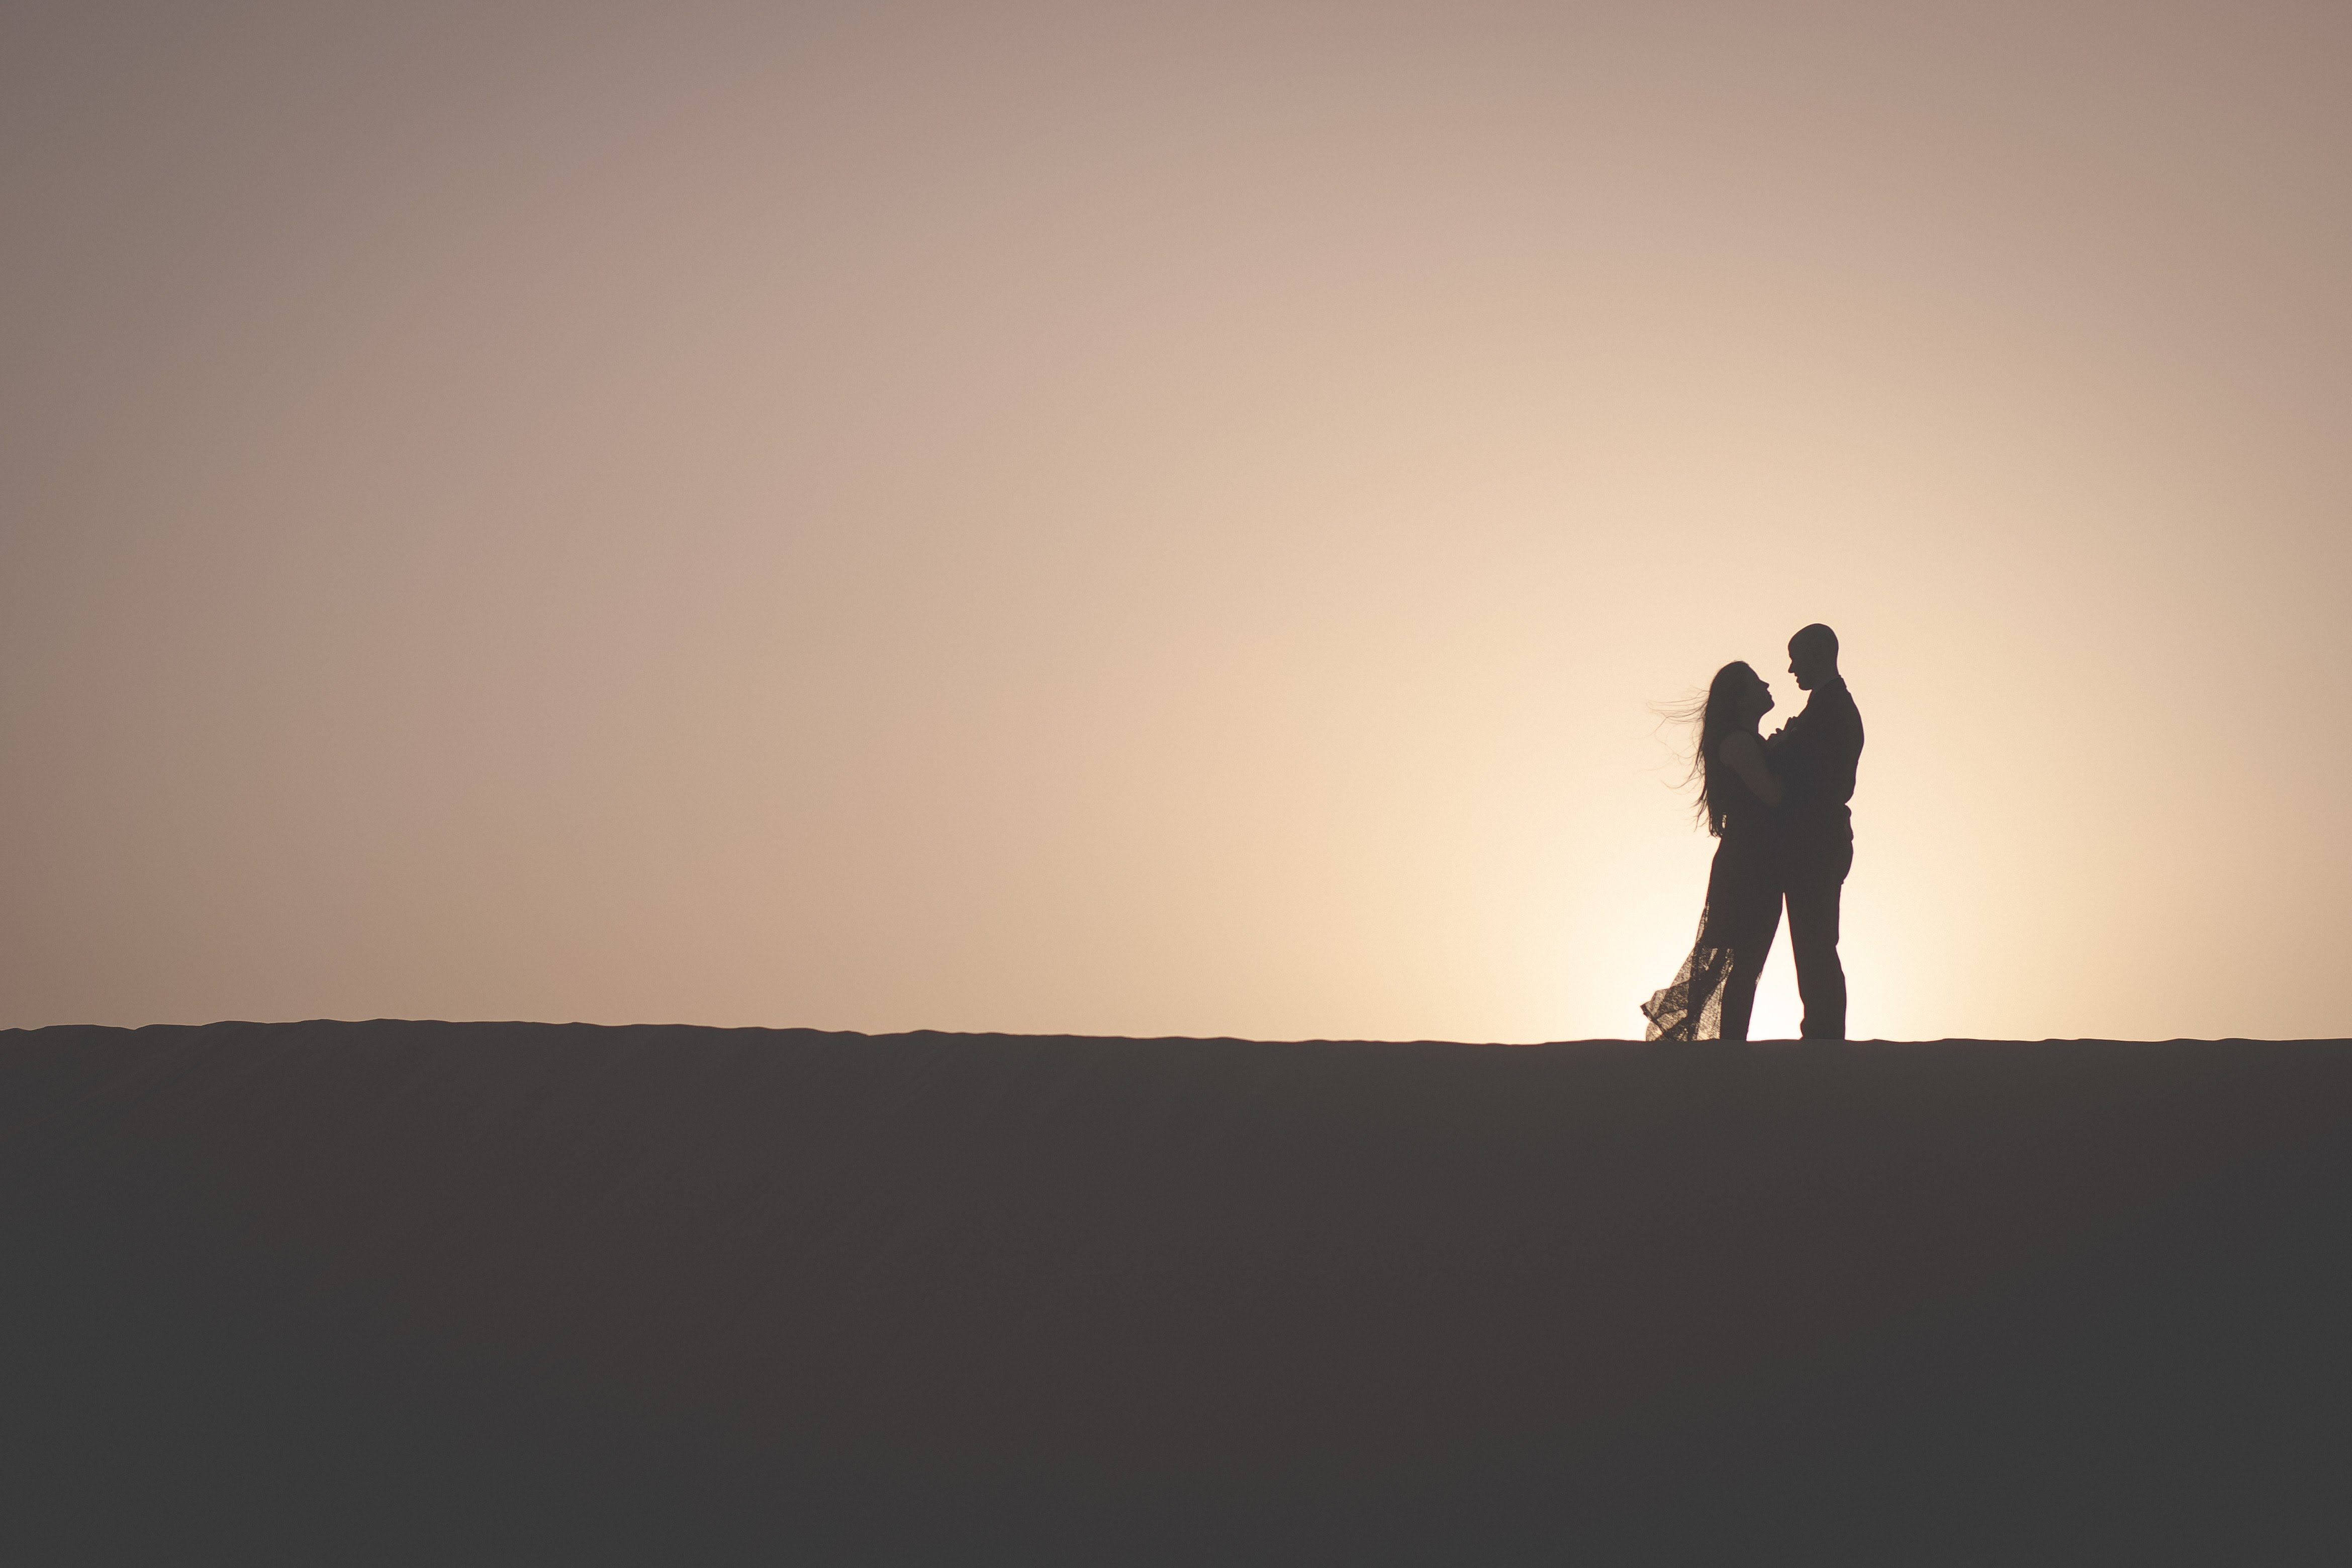 desert engagement photo at sunset